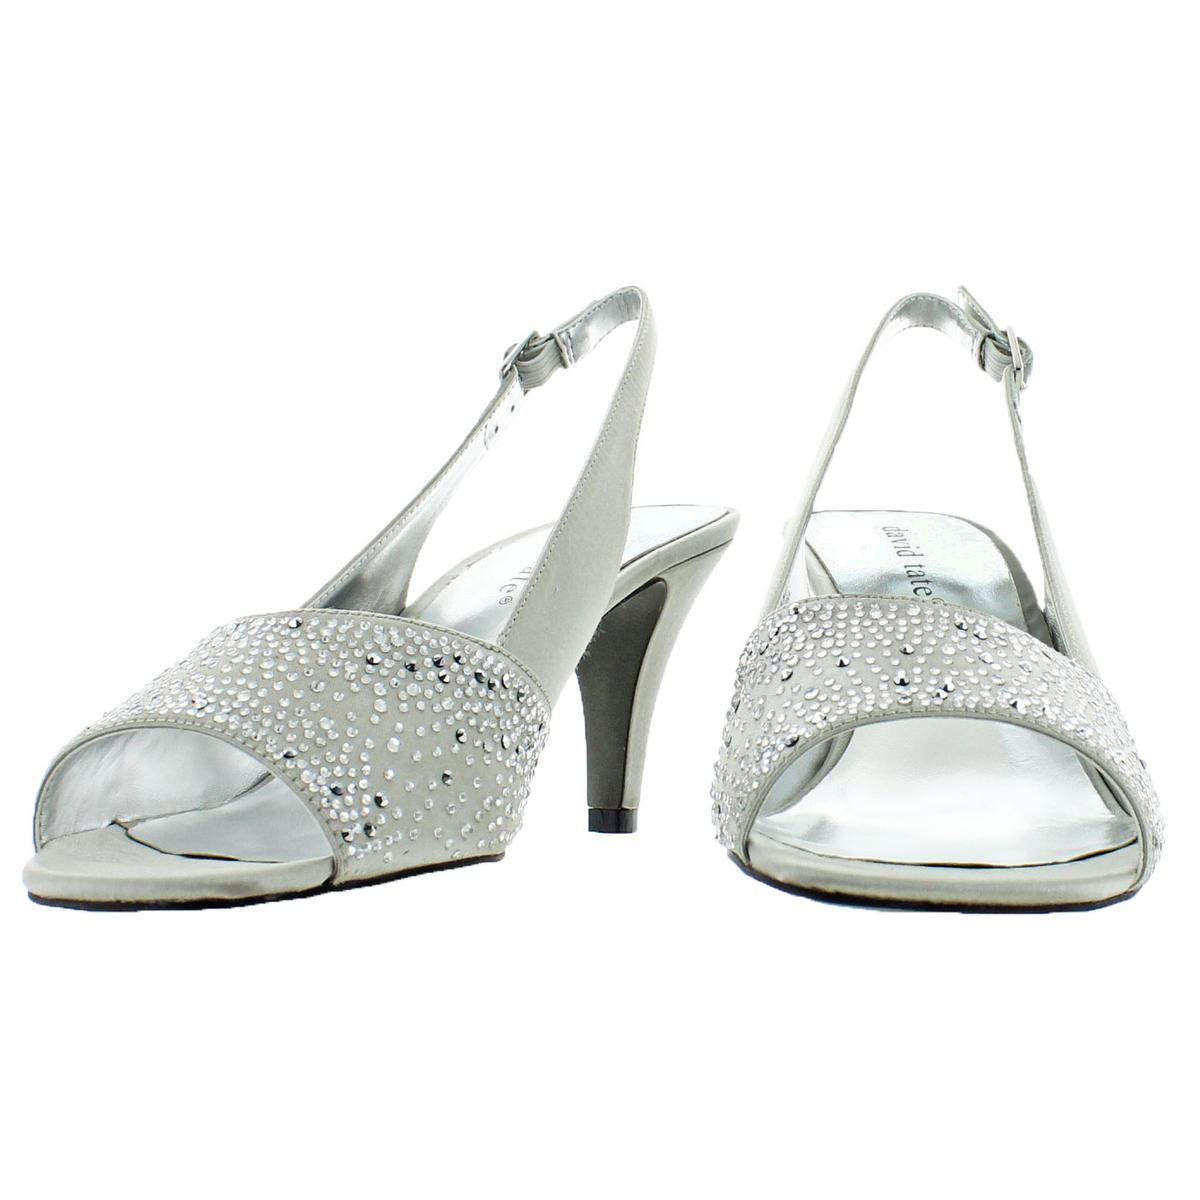 David-Tate-Women-039-s-Stunning-Satin-Embellished-Slingback-Dress-Pump thumbnail 13